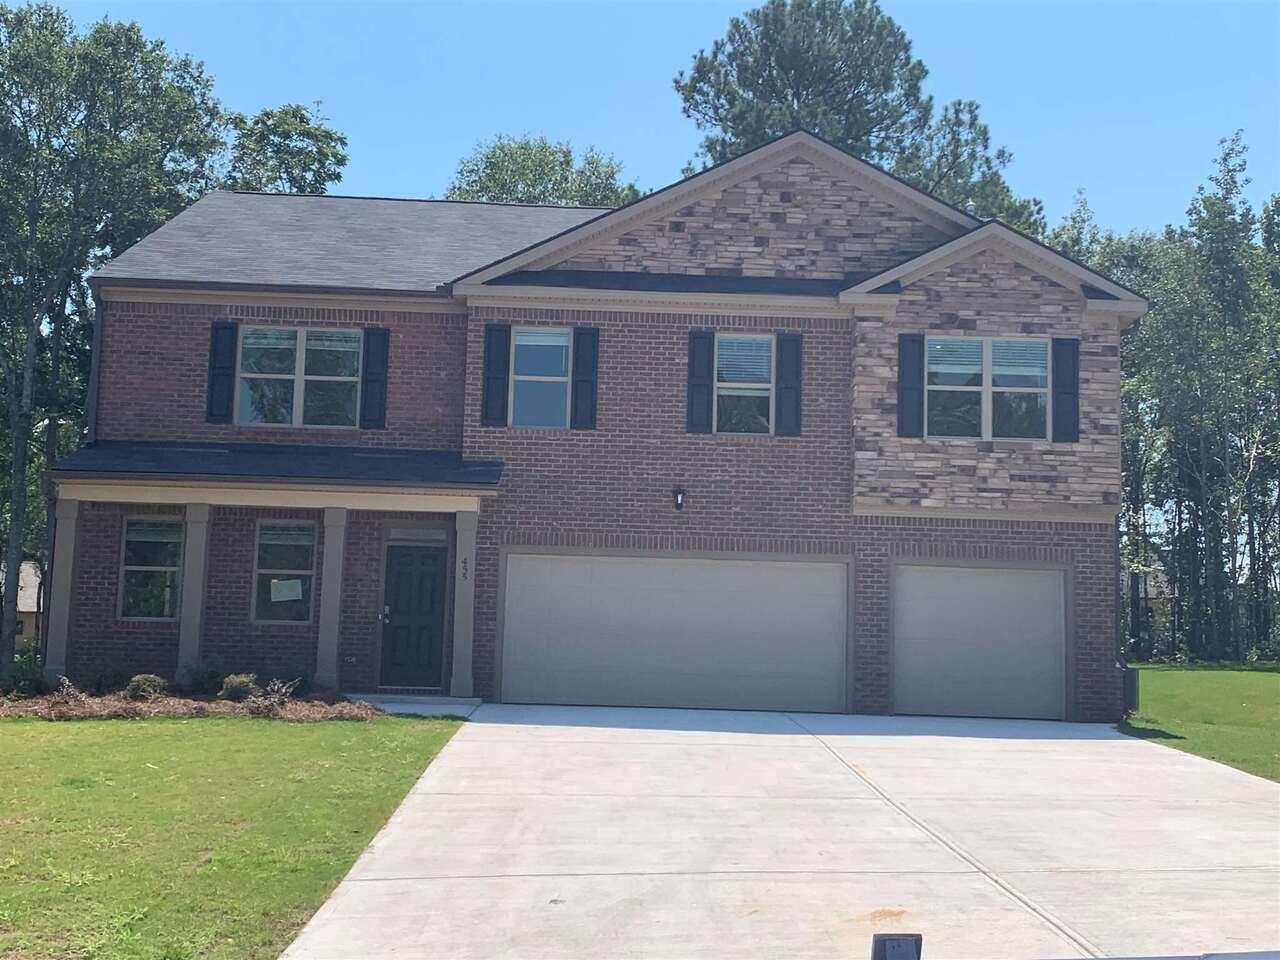 808 Tallowtree Ln, McDonough, GA 30252 - MLS#: 8911449